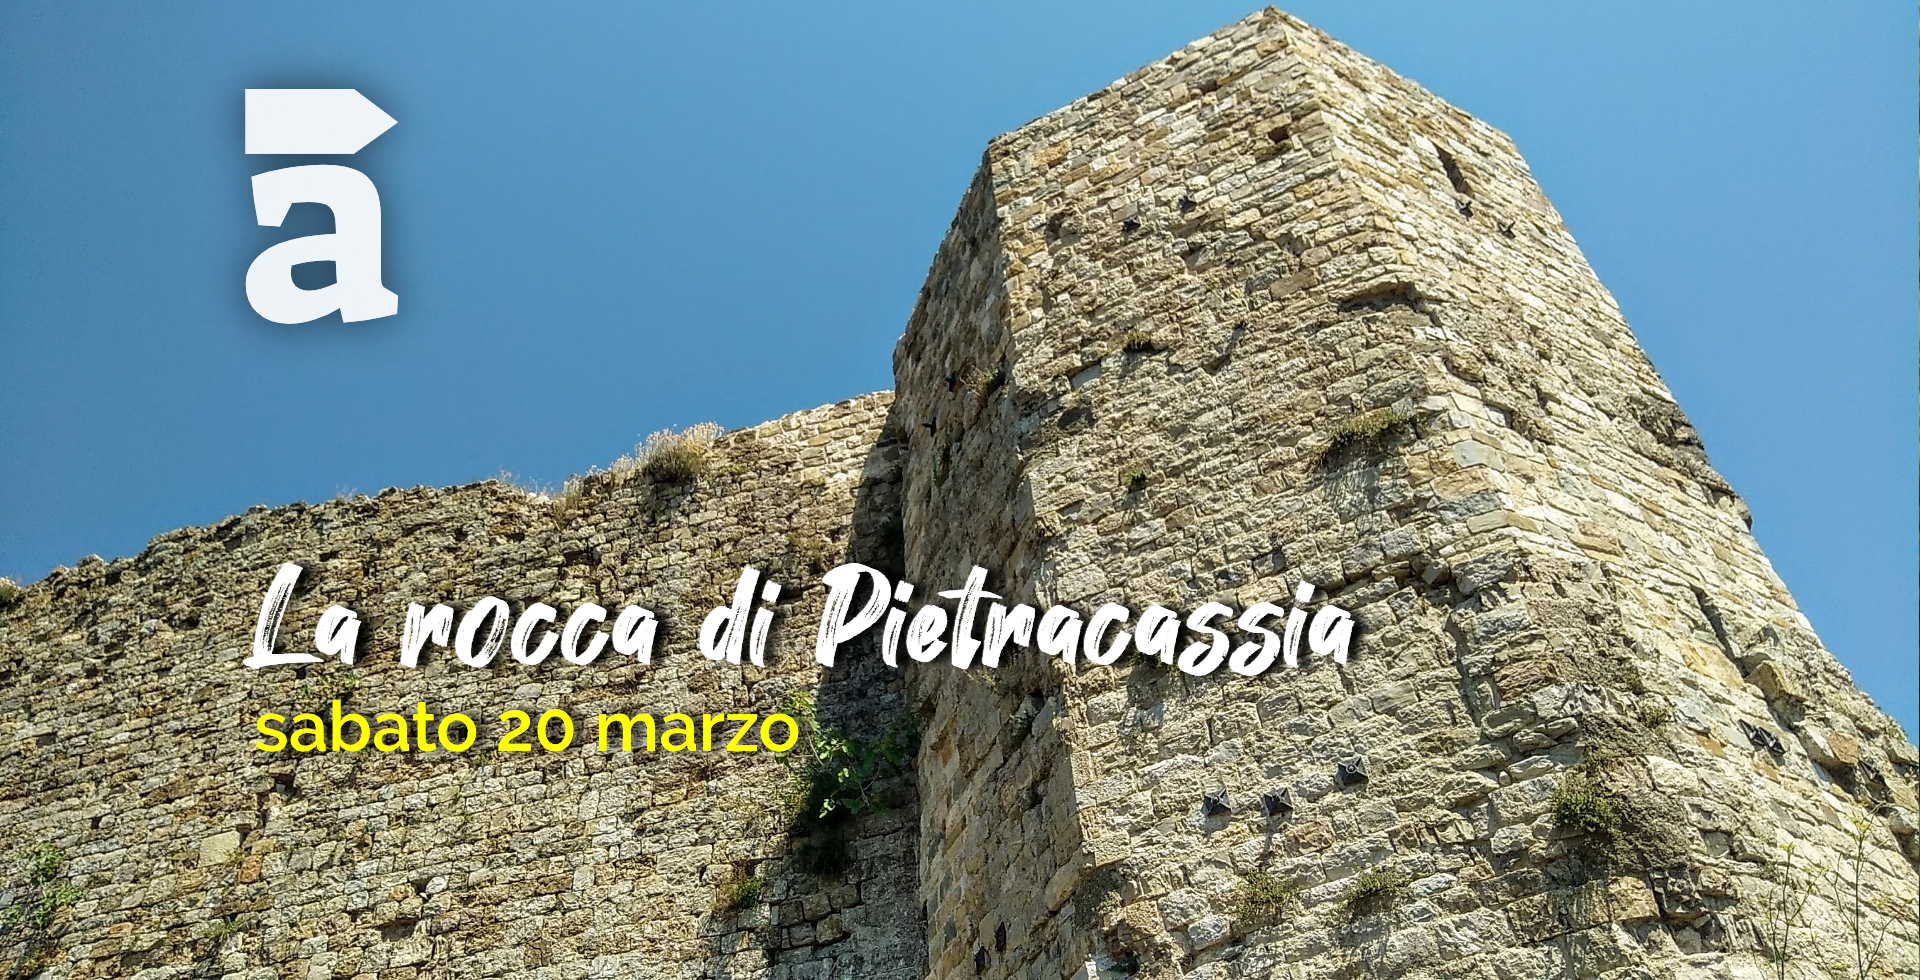 Pietracassia_2021 (1).jpg